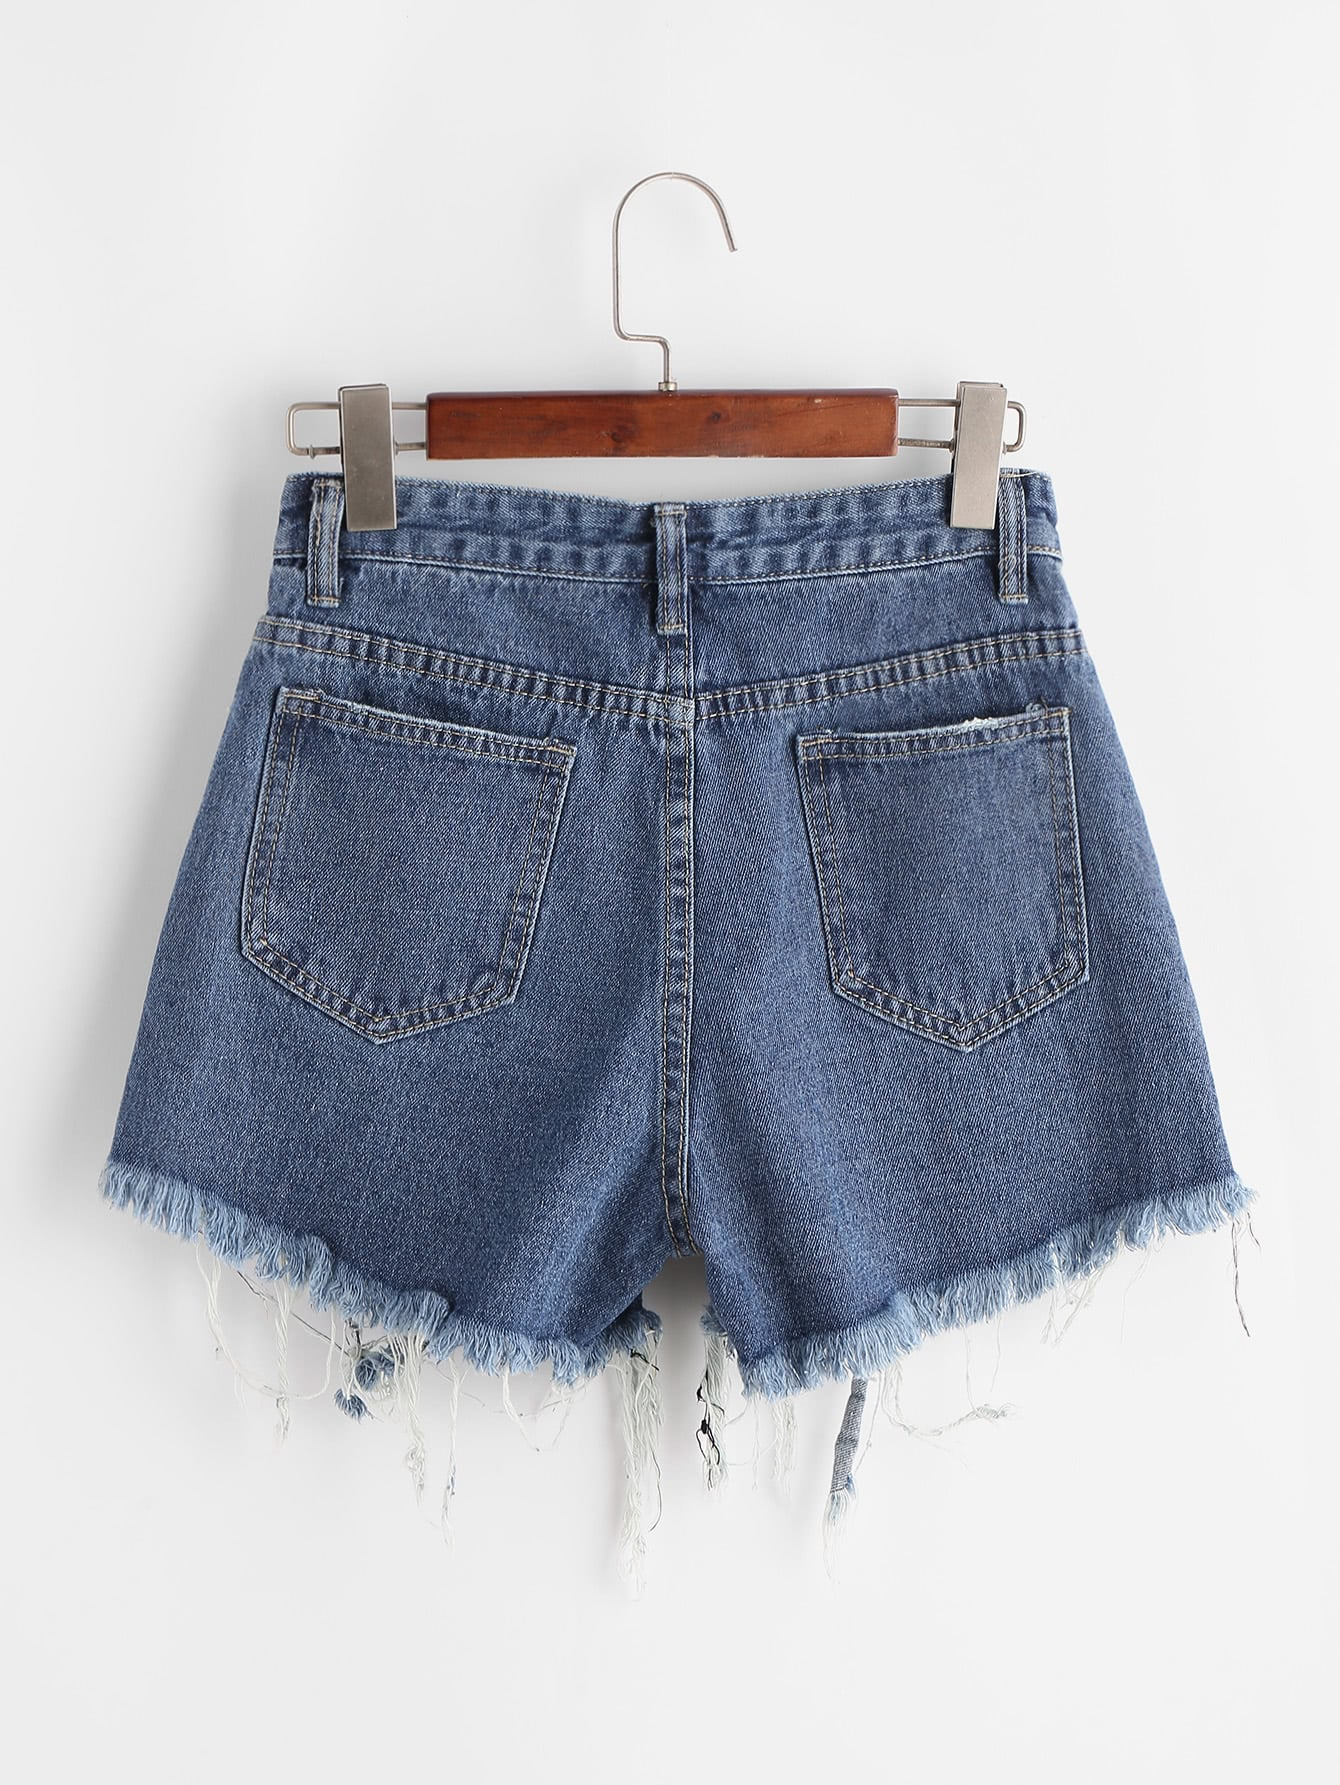 shorts170327002_2